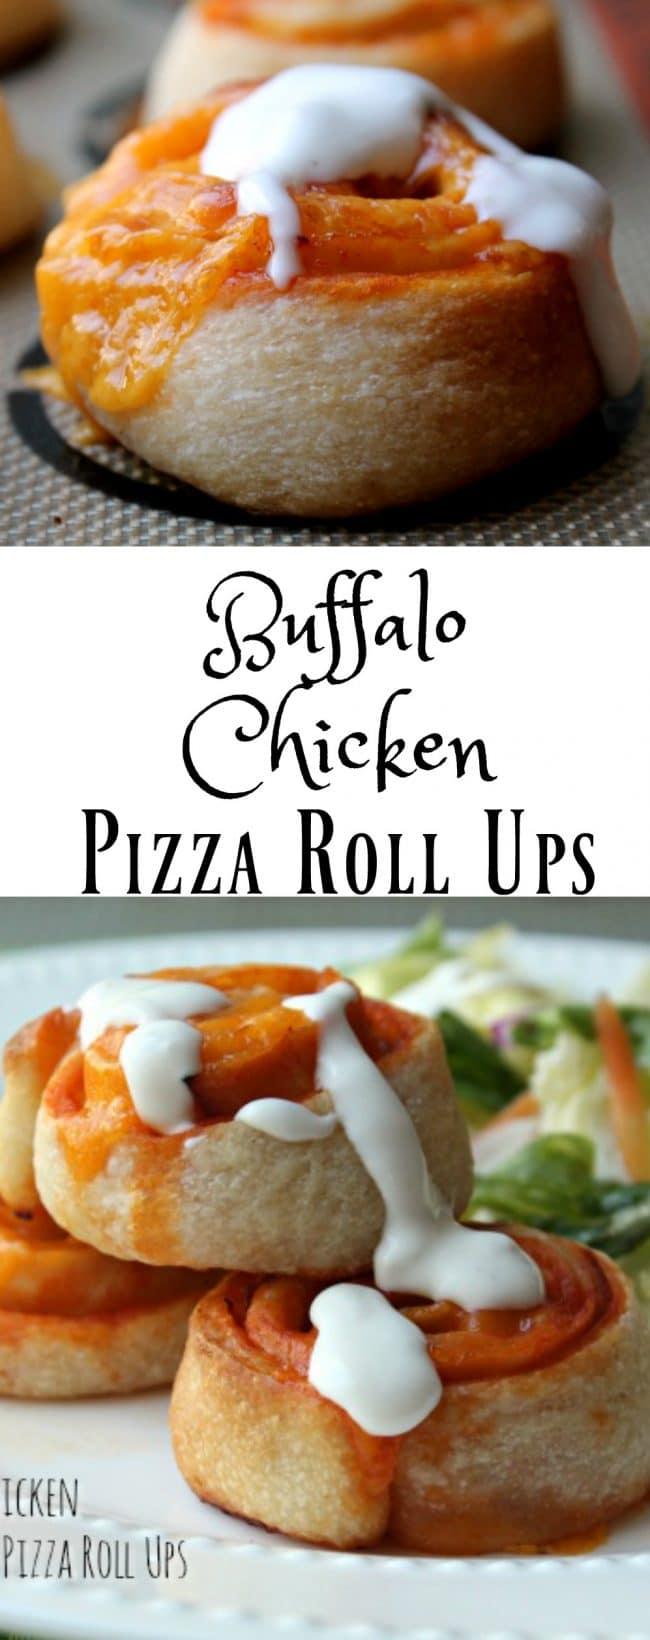 buffalo chicken pizza roll ups